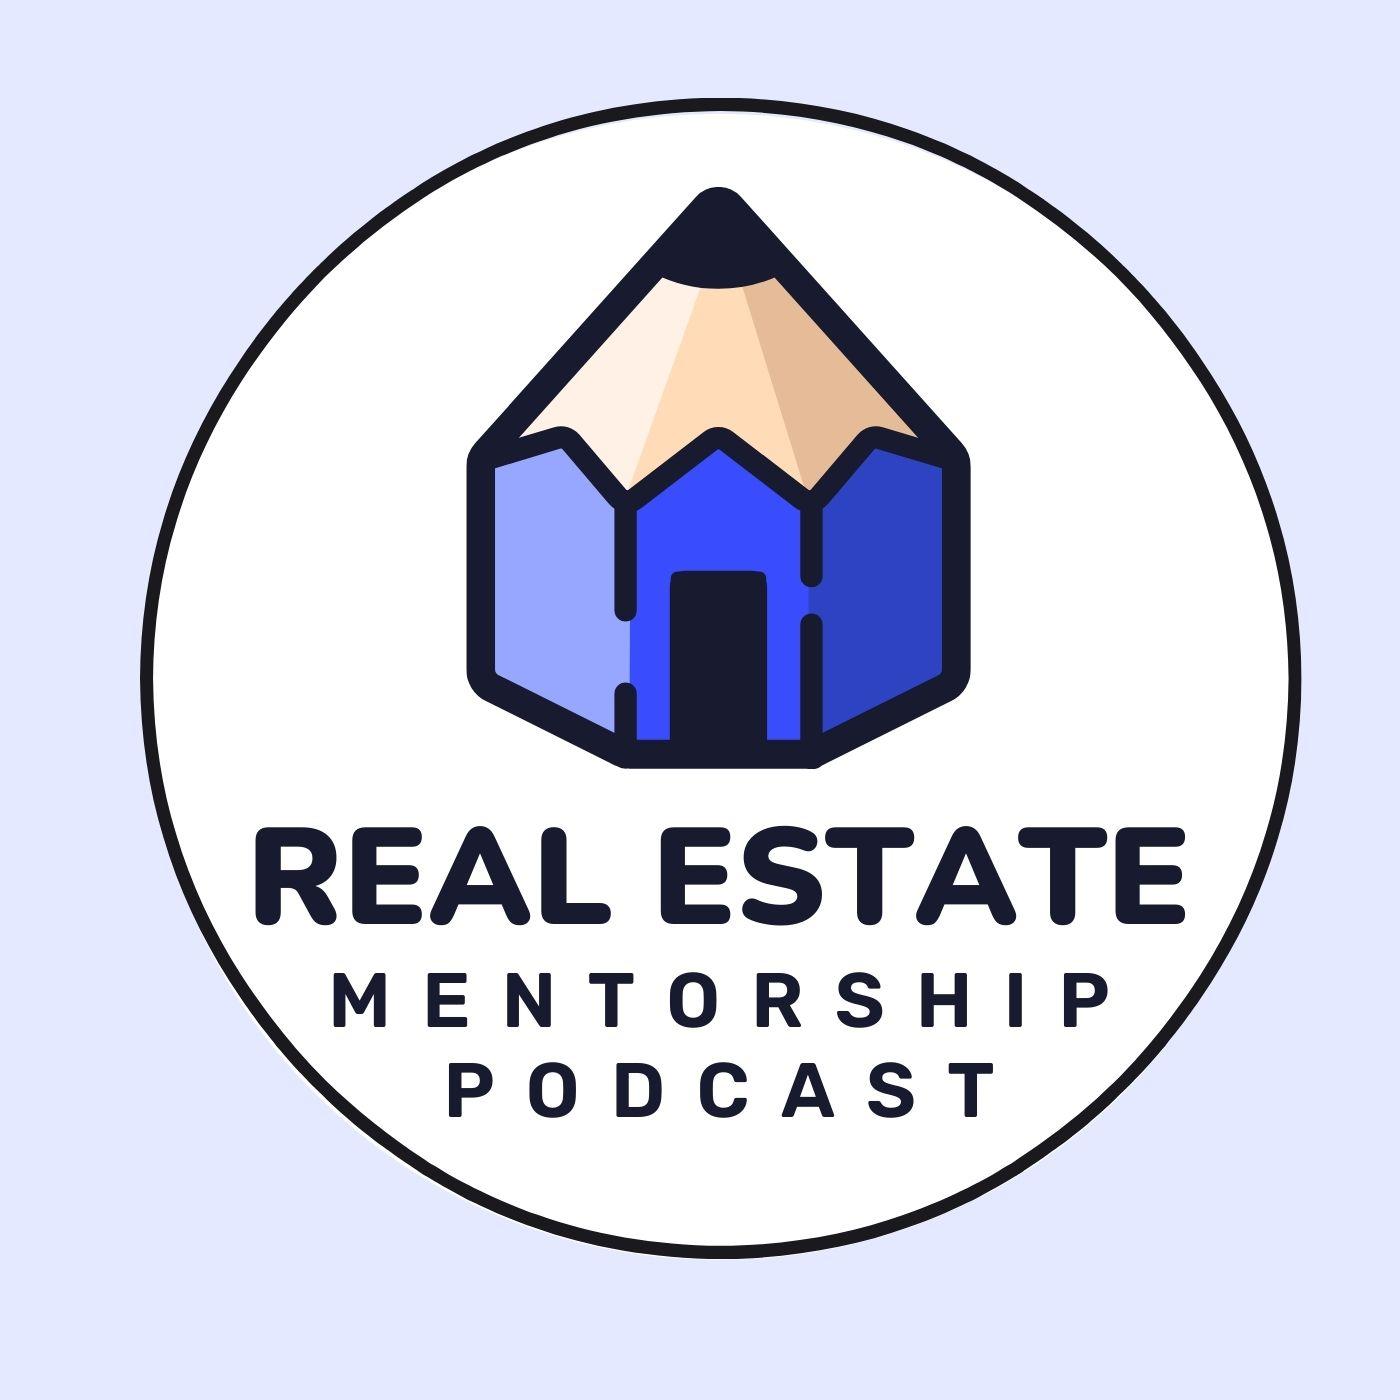 Real Estate Mentorship Podcast Ep. 1 show art